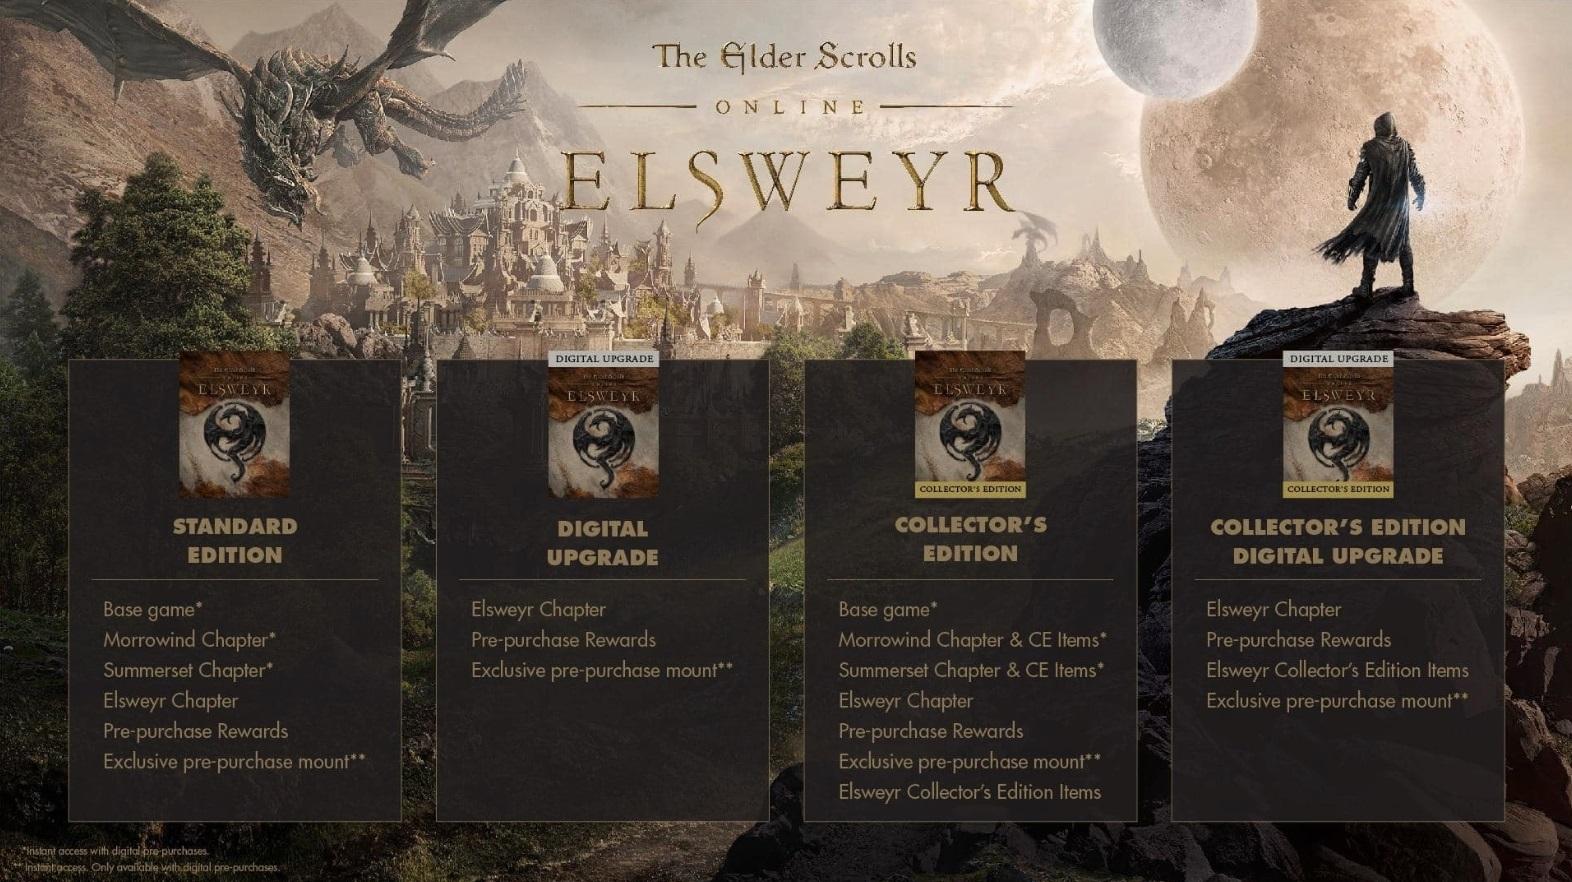 elsweyr chapter information